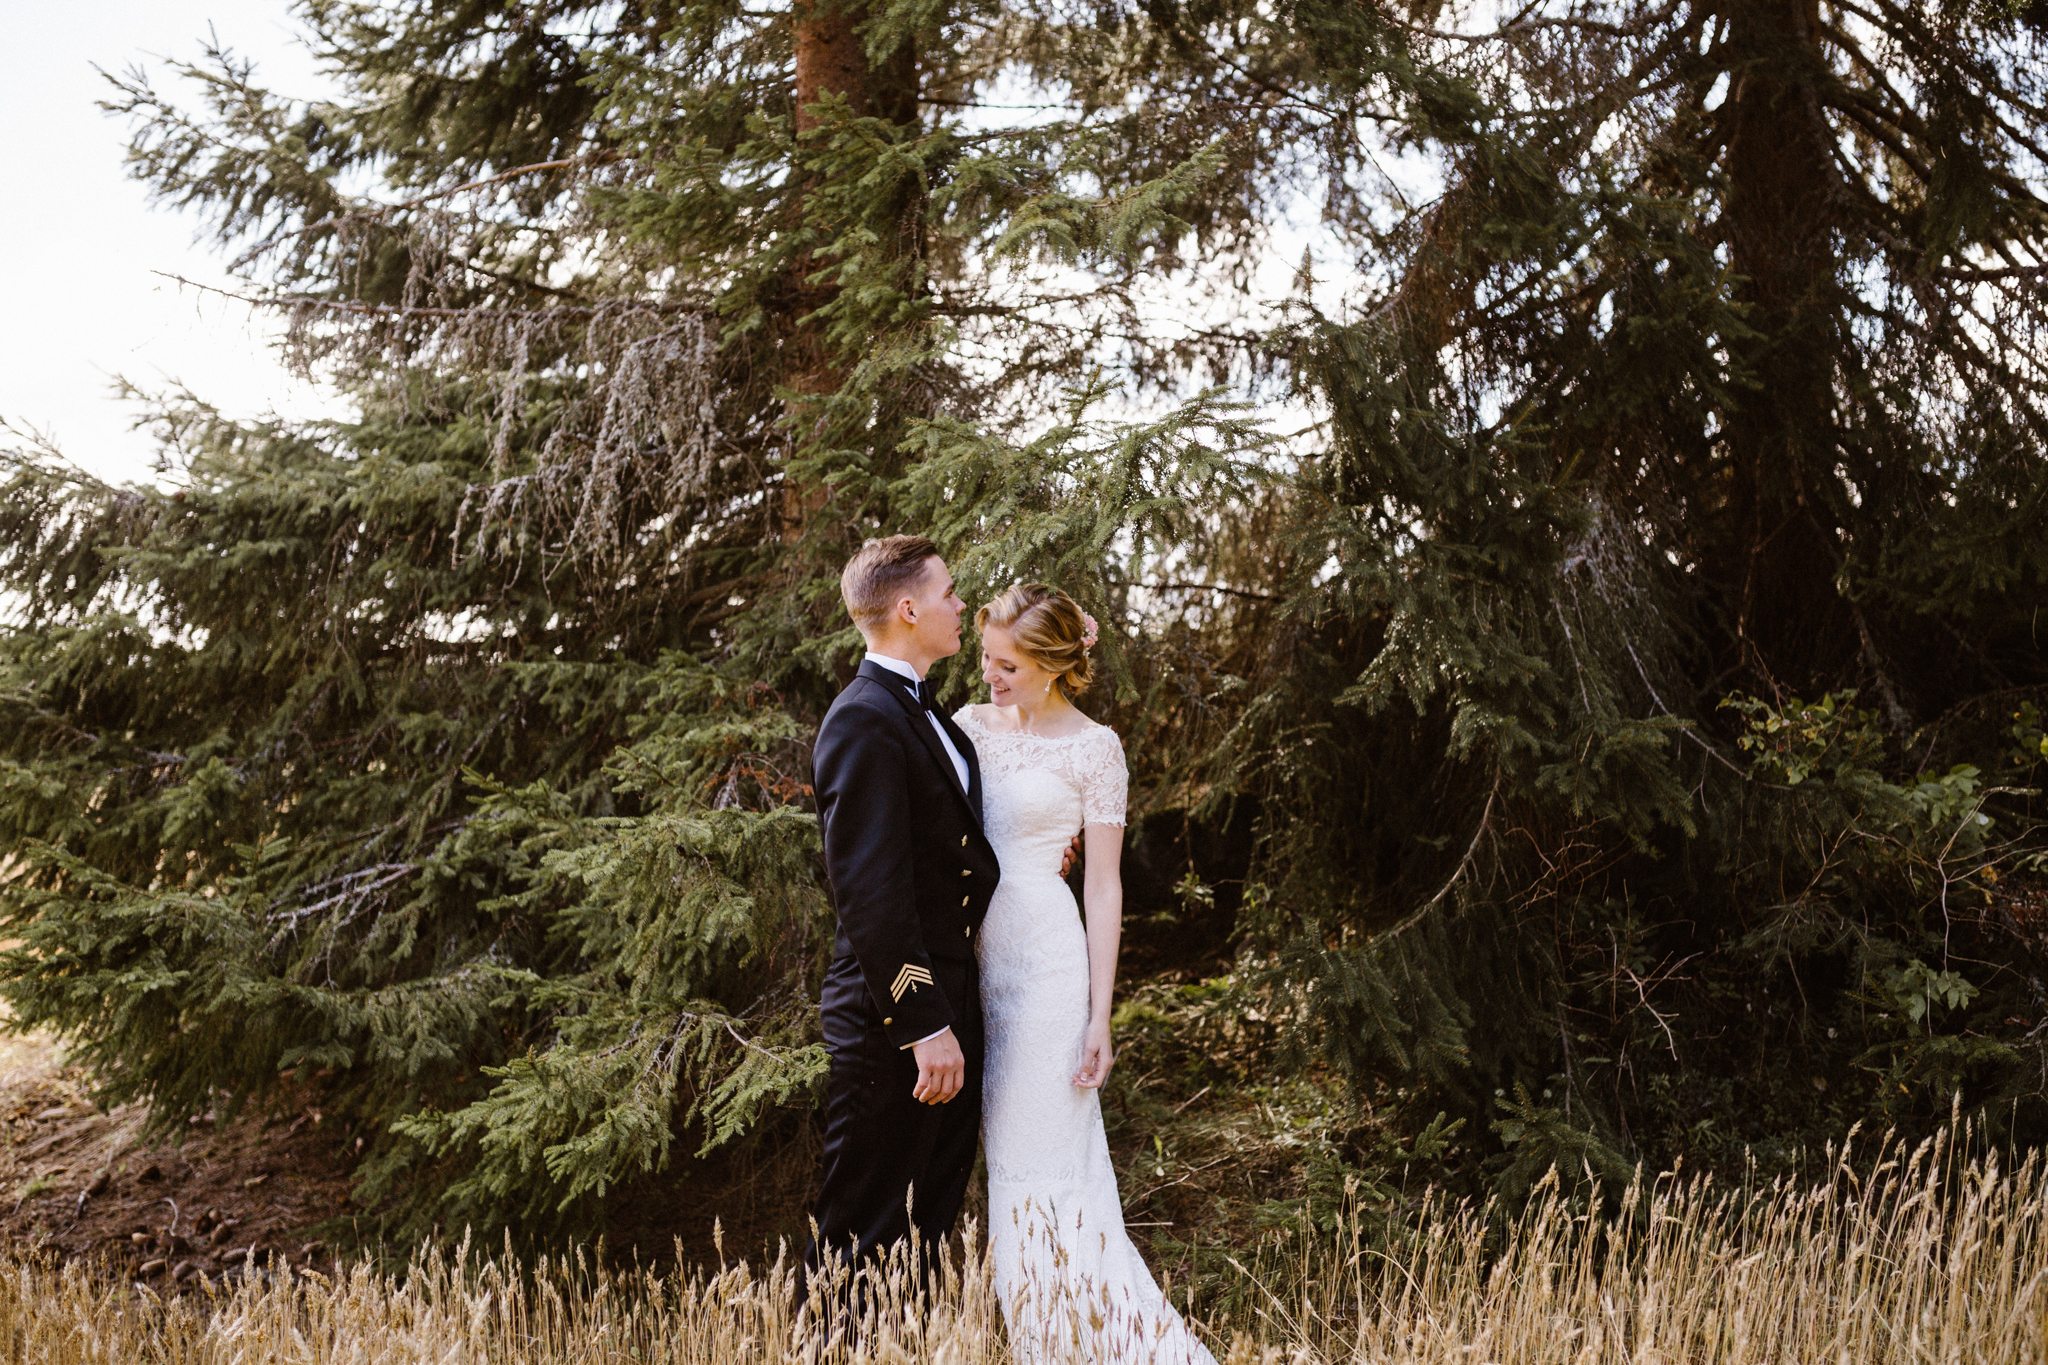 Pinja + Marko -- Patrick Karkkolainen Wedding Photographer-85.jpg